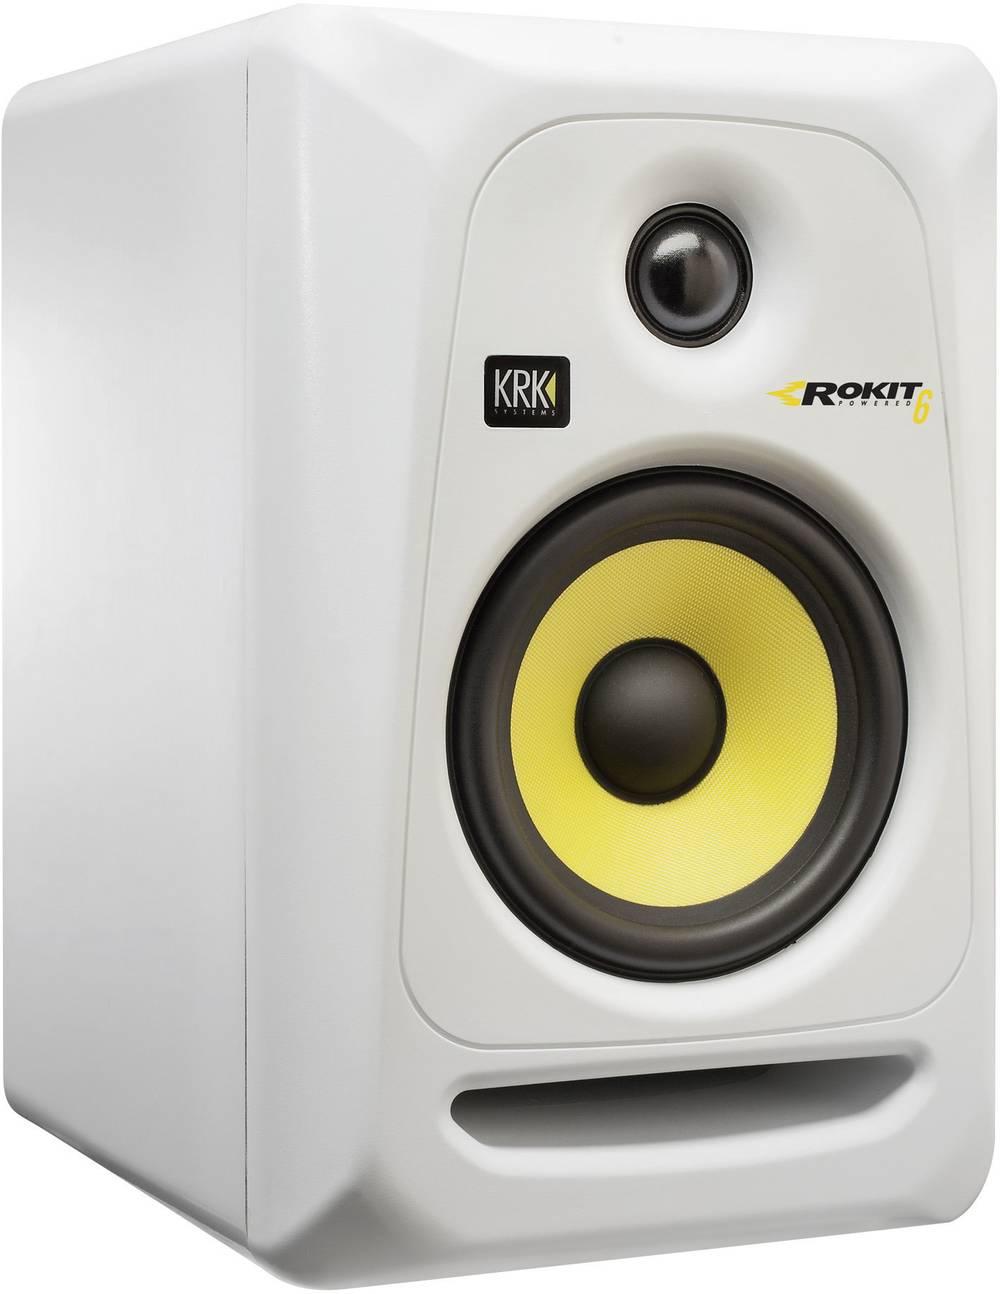 KRK RP6G3 studijski monitorski zvočnik bela KKRP6G3SE KRK Systems